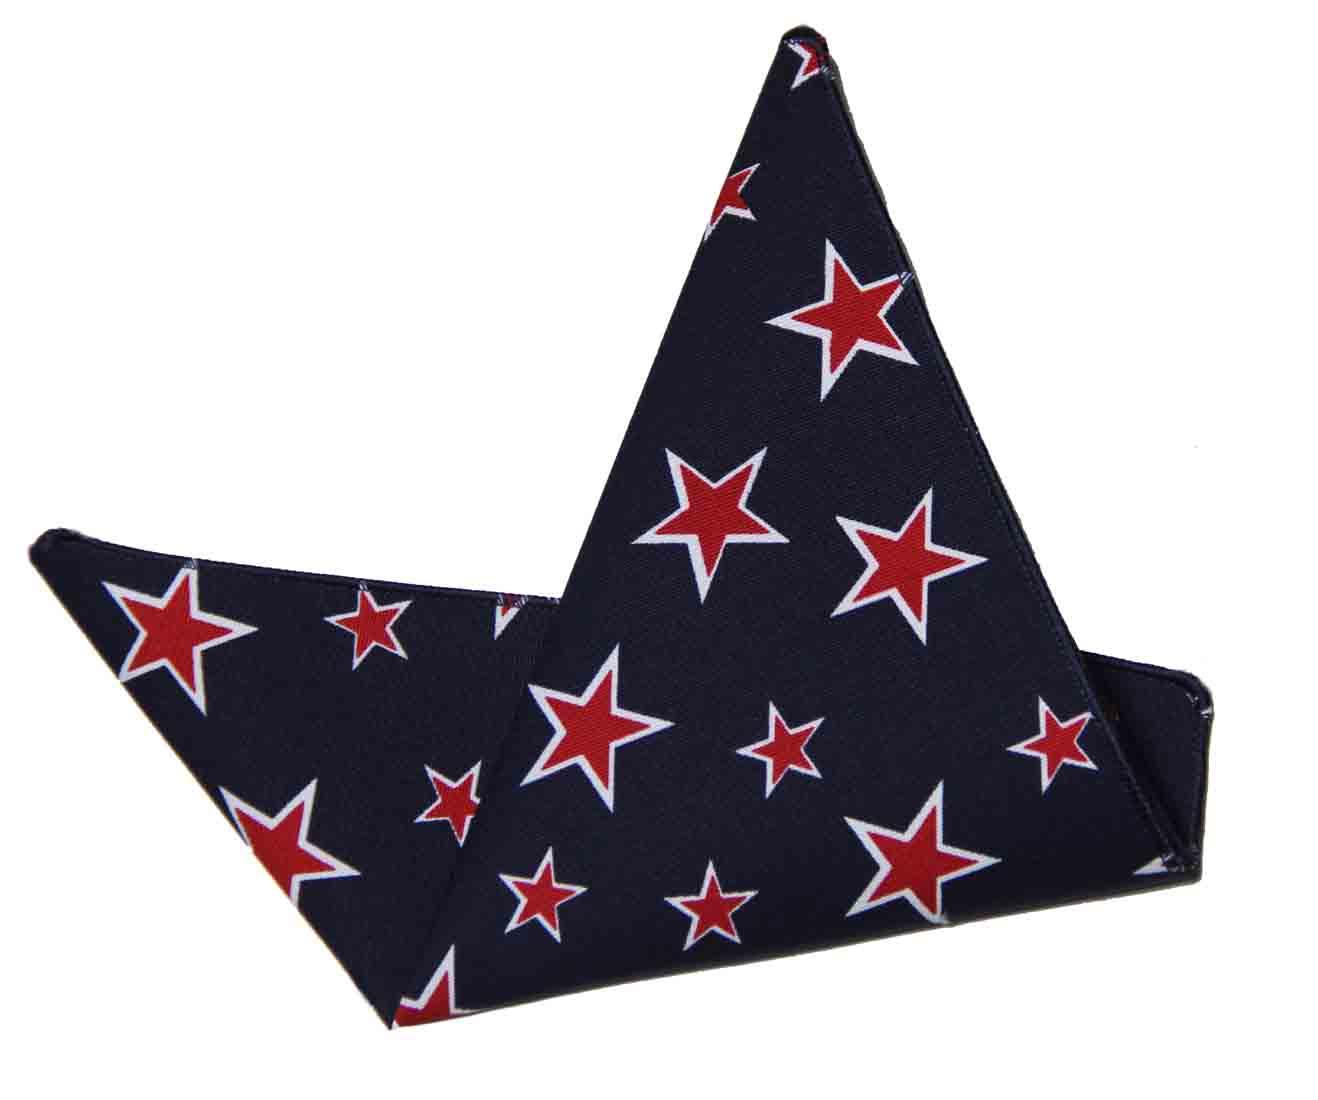 Gascoigne Pocket Square LInen Cotton Navy Blue Red White Stars Pattern Men's